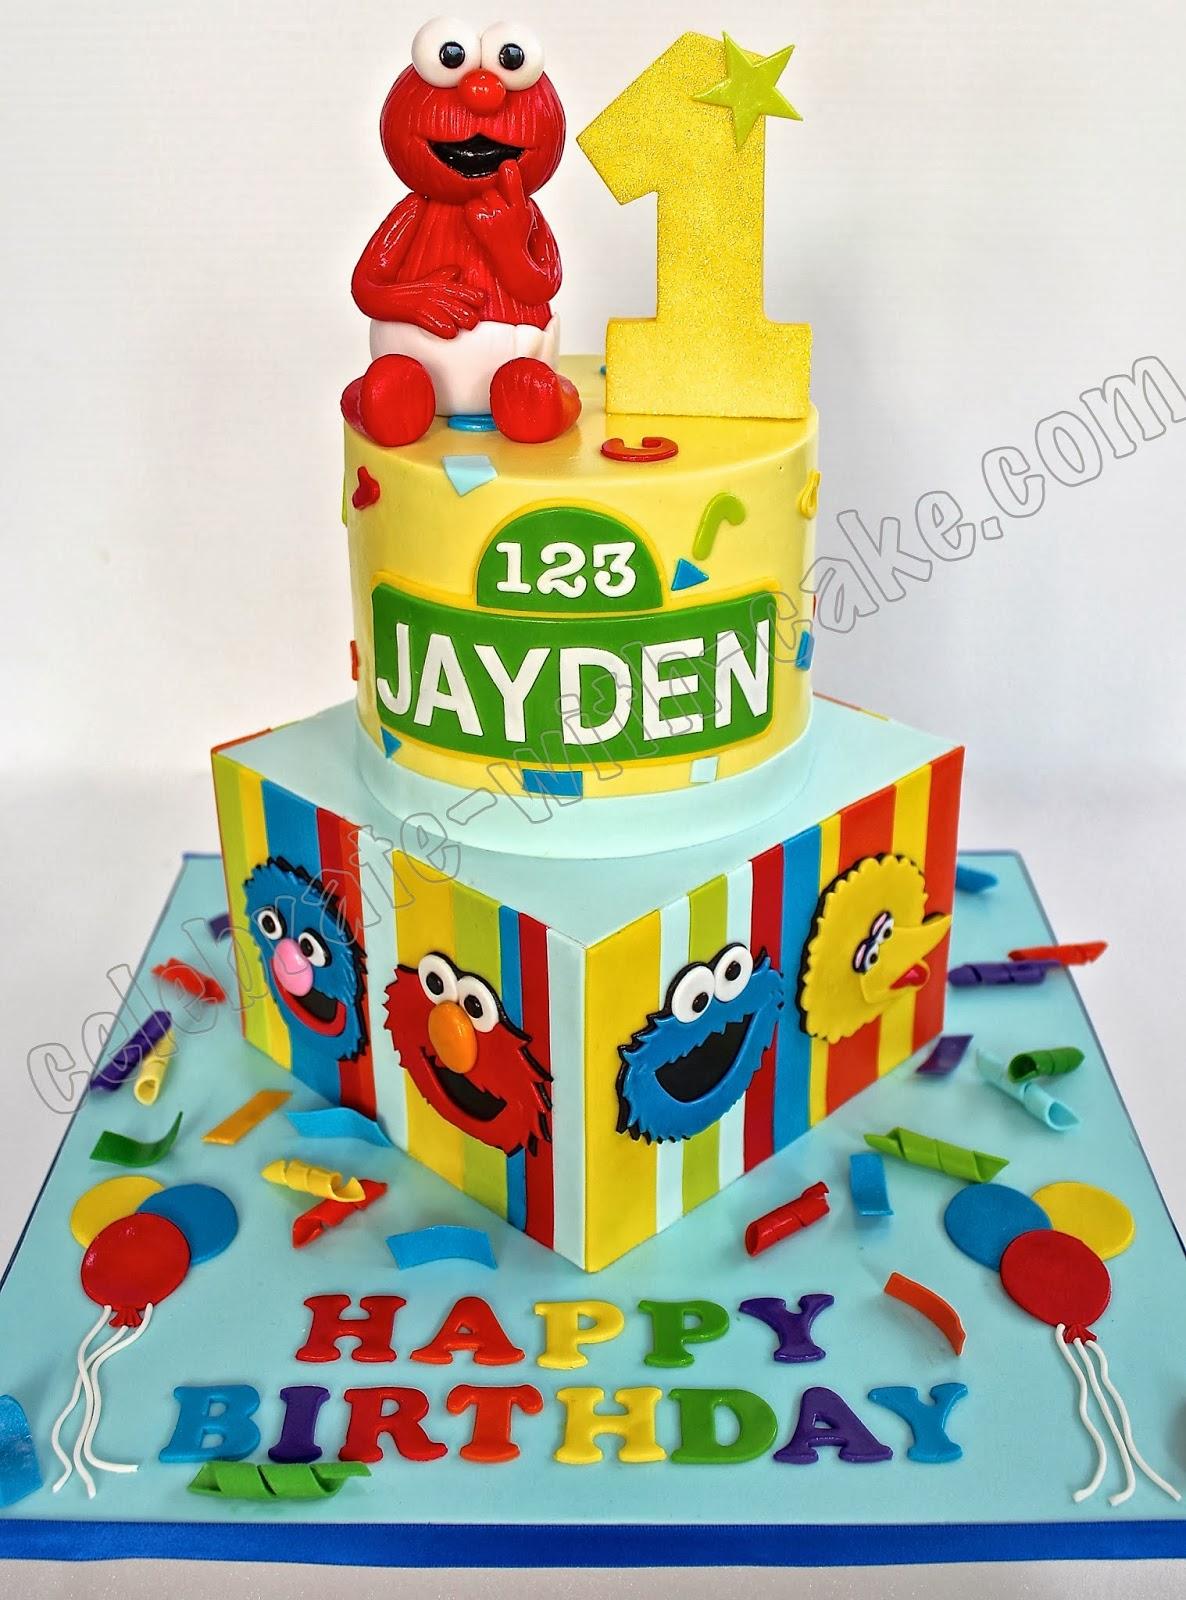 Sesame Street Birthday Cake.Sesame Street 1st Birthday Featuring Baby Elmo 2 Tier Cake